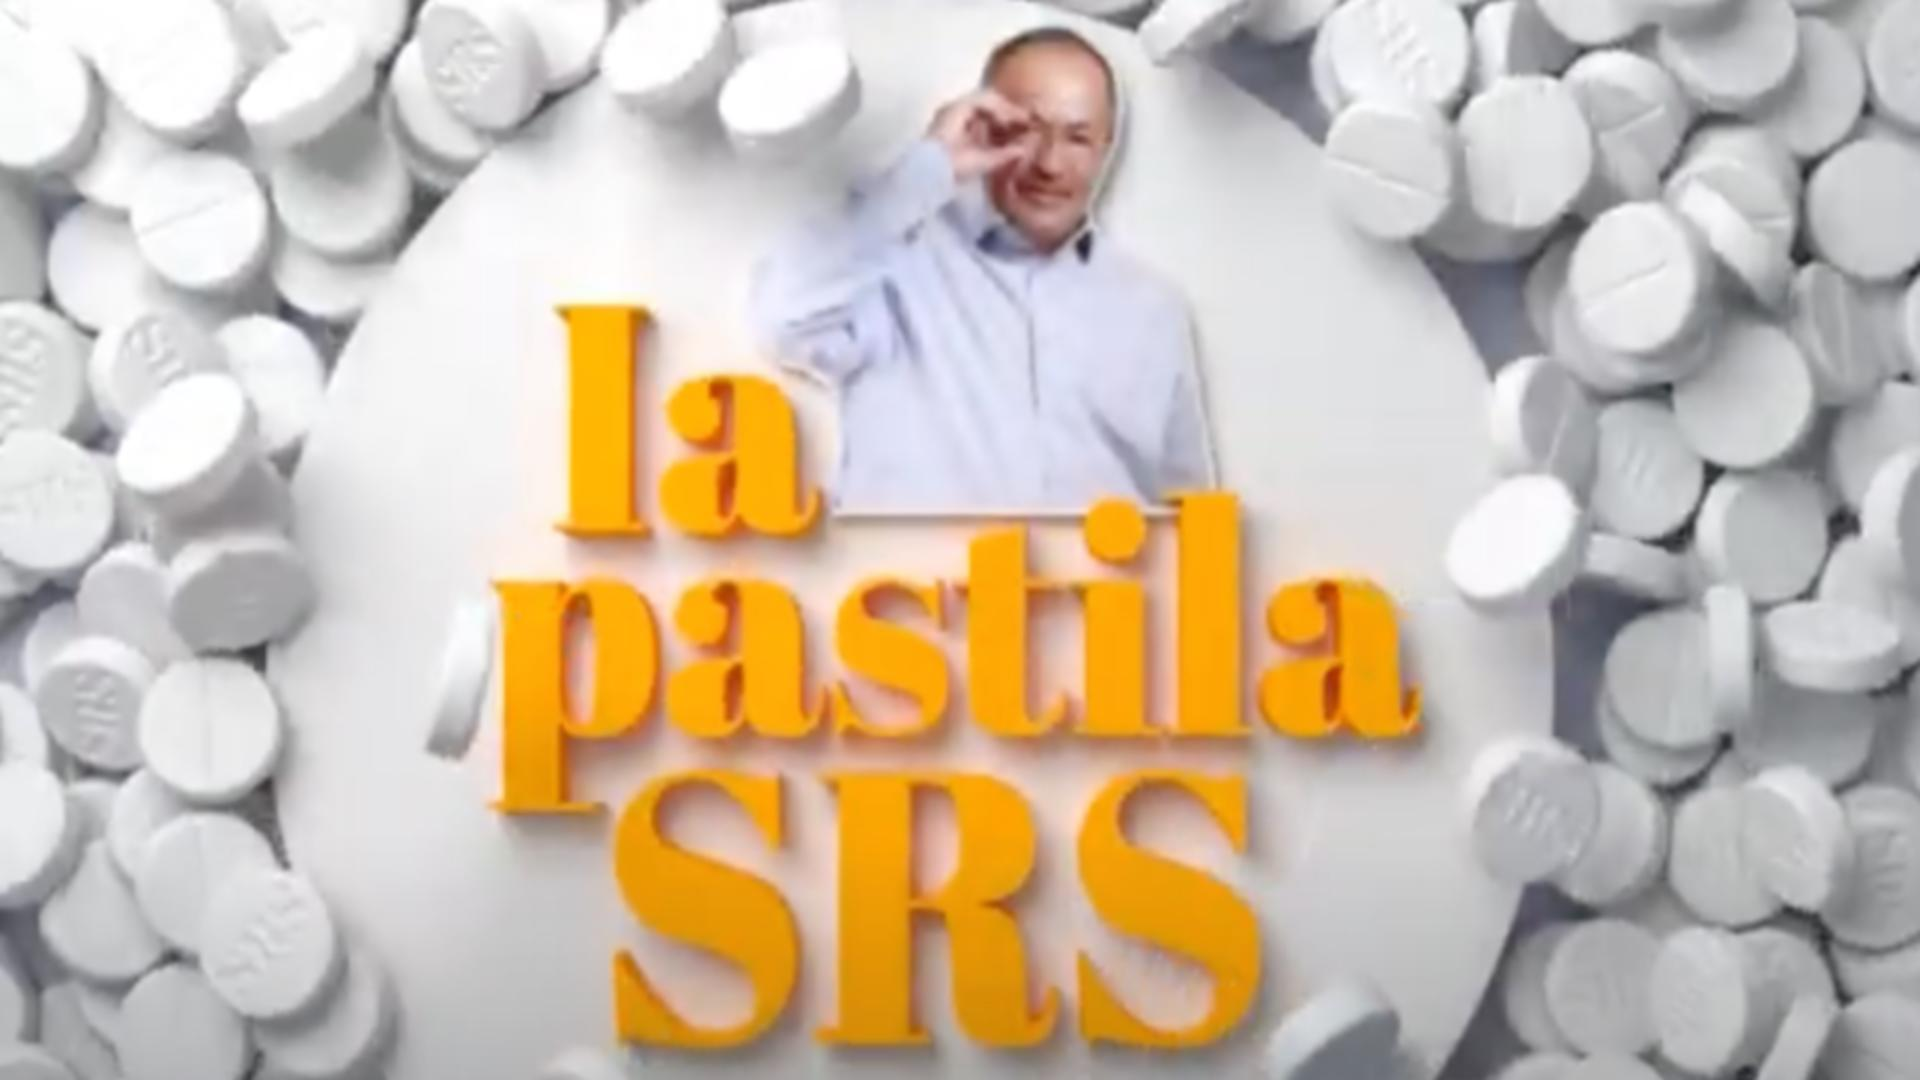 Ia pastila SRS